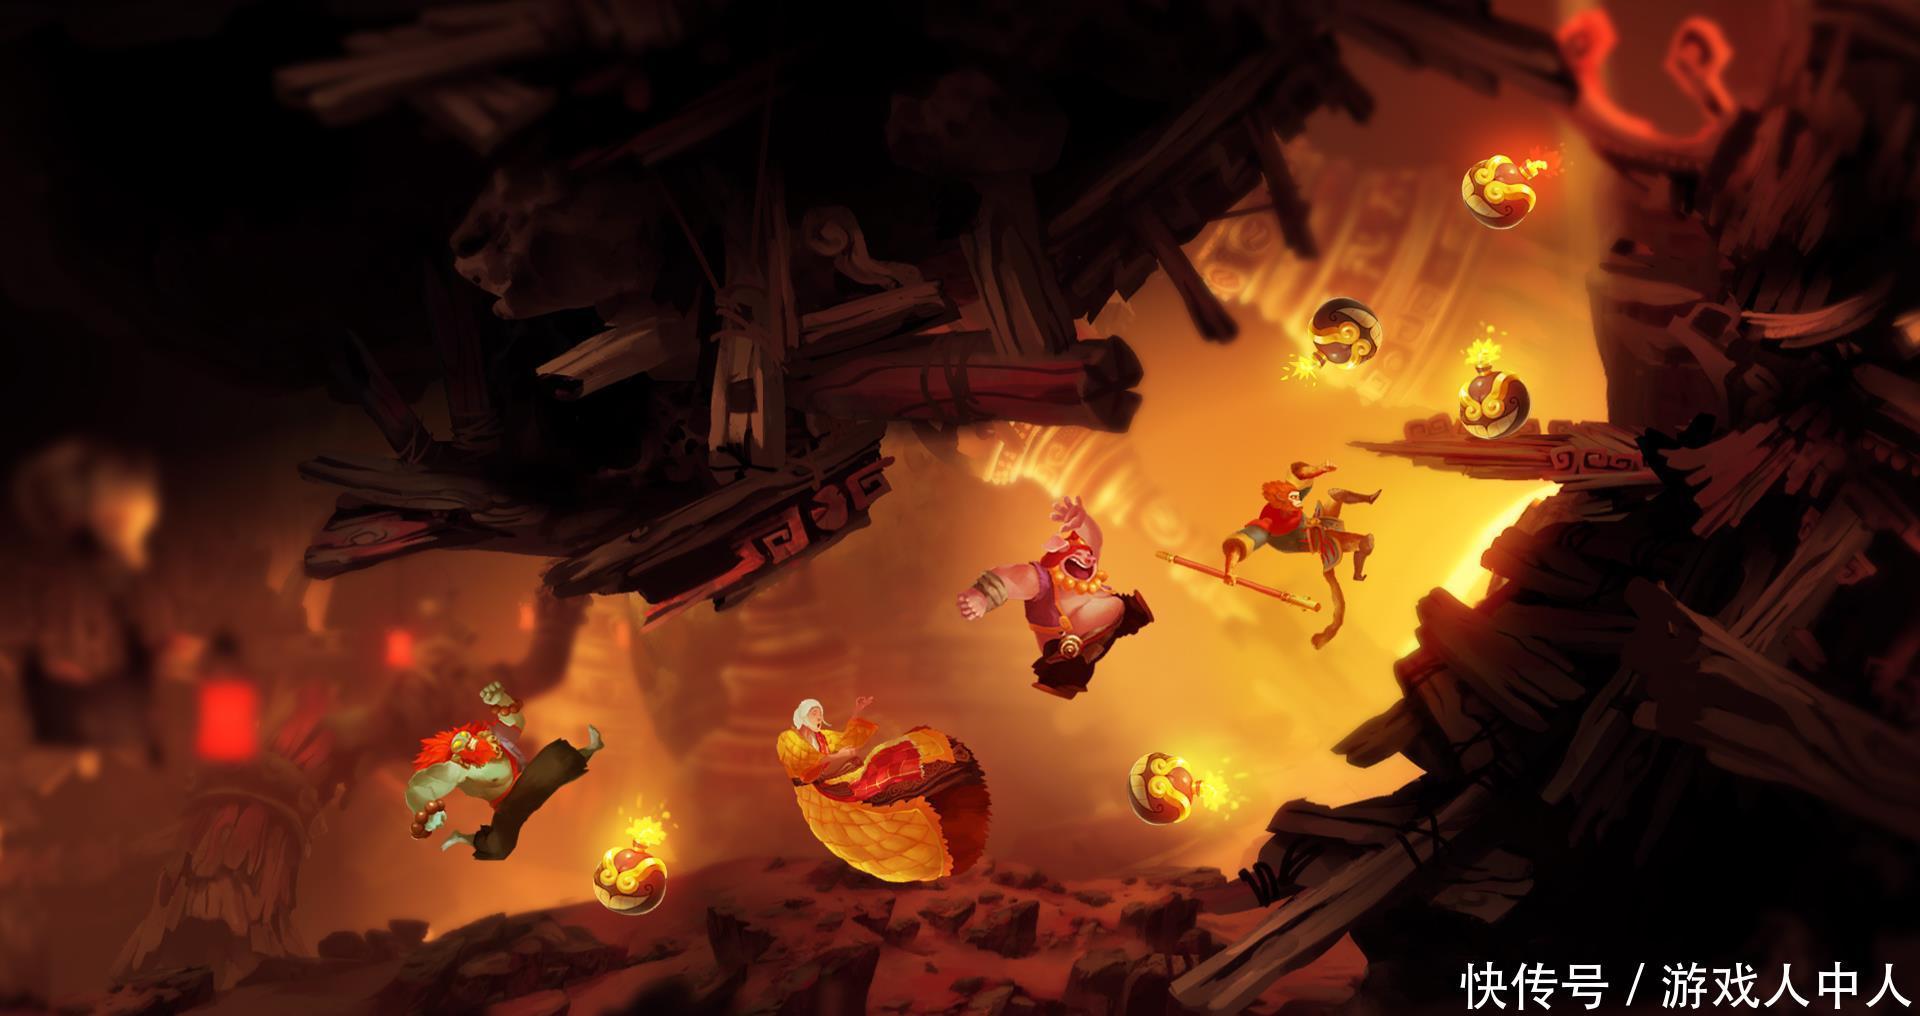 Fami通游戏评分《西游记》改编作《非常英雄》获31分